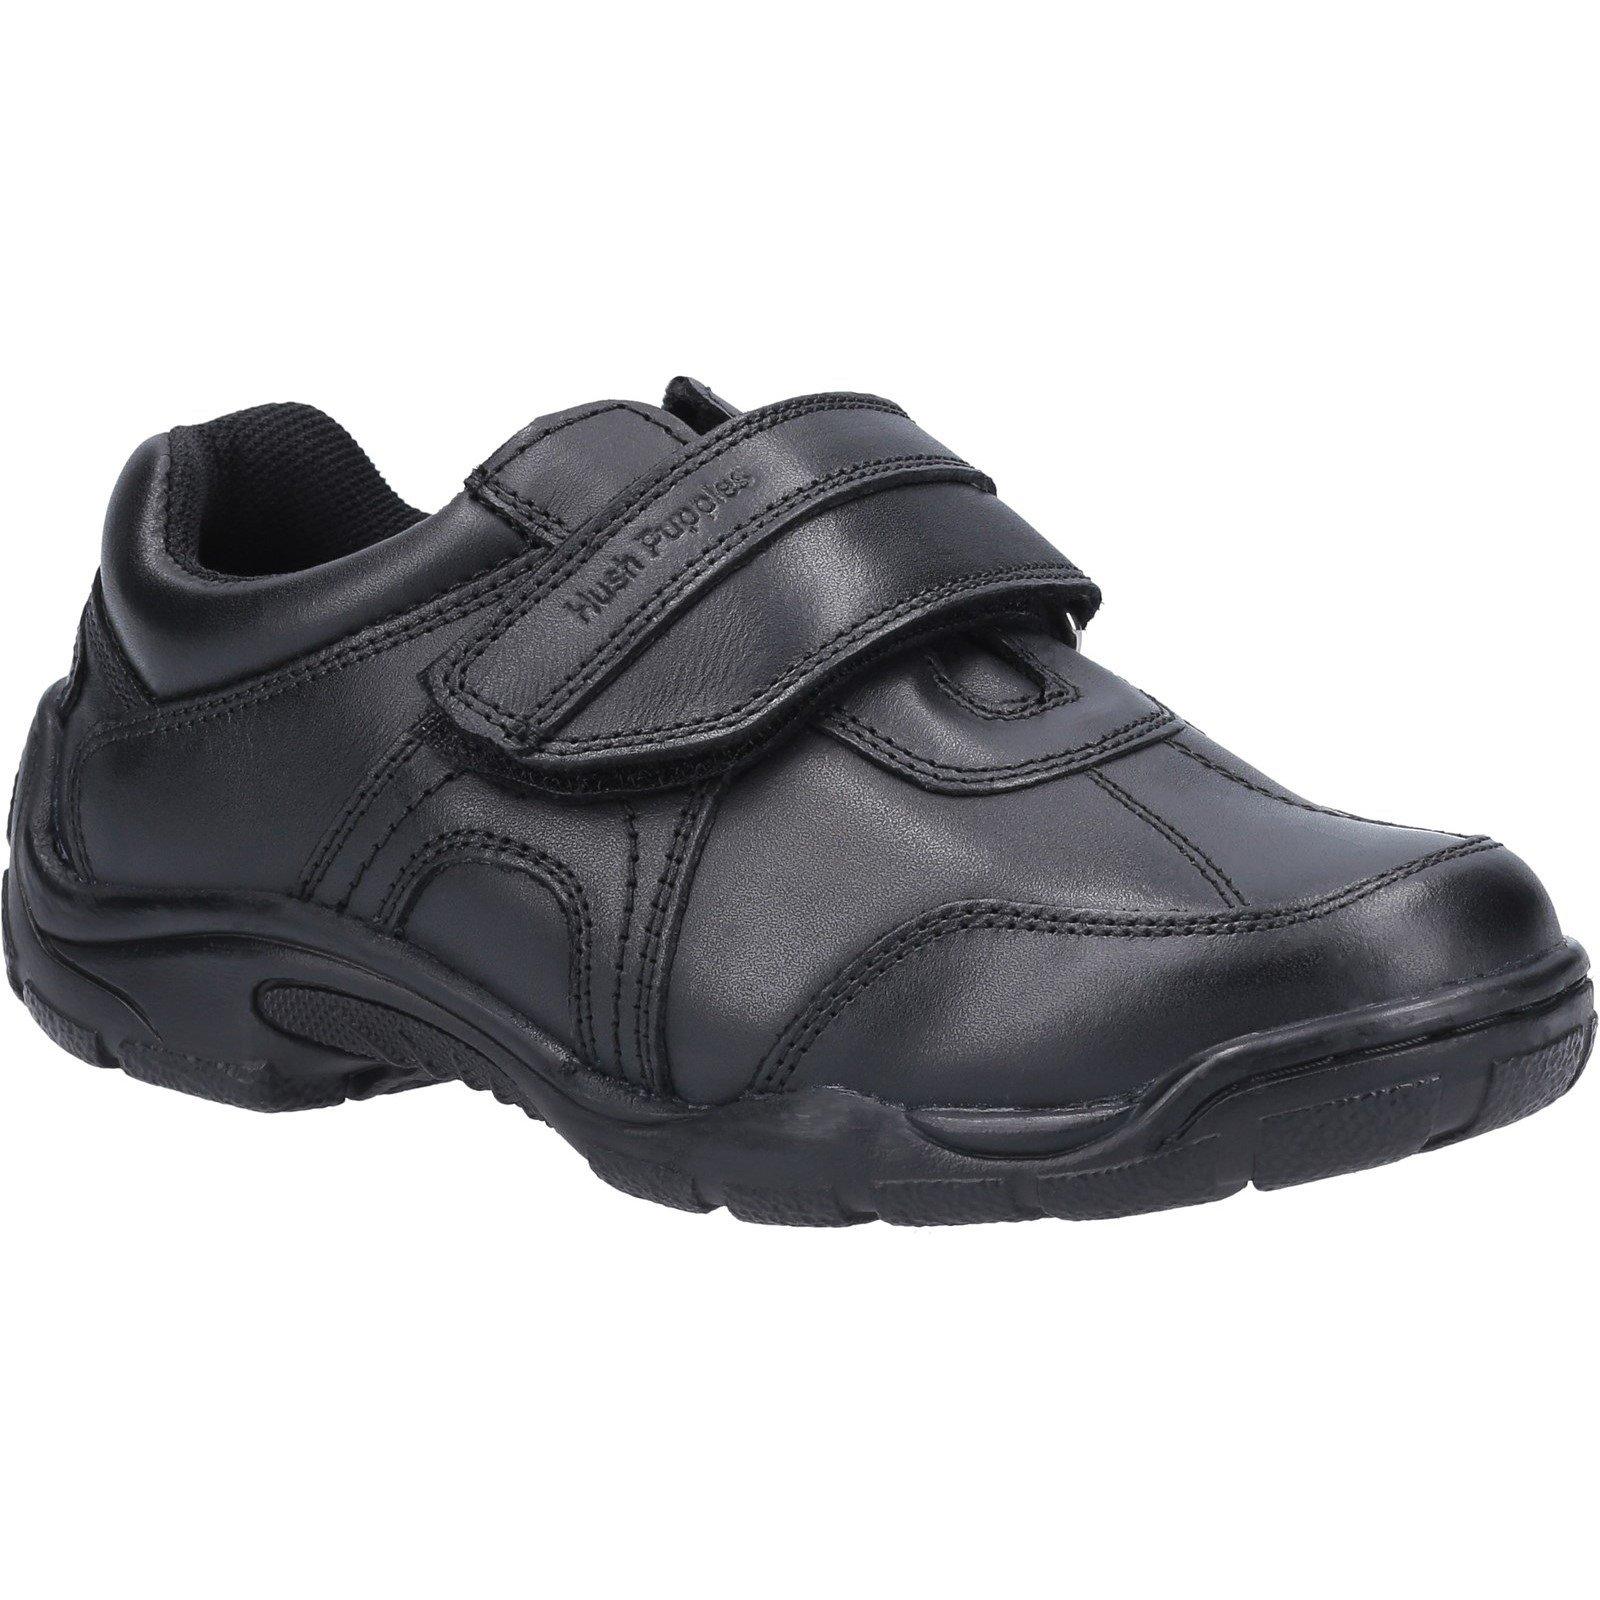 Hush Puppies Kid's Arlo Junior School Shoe Black 30853 - Black 10.5